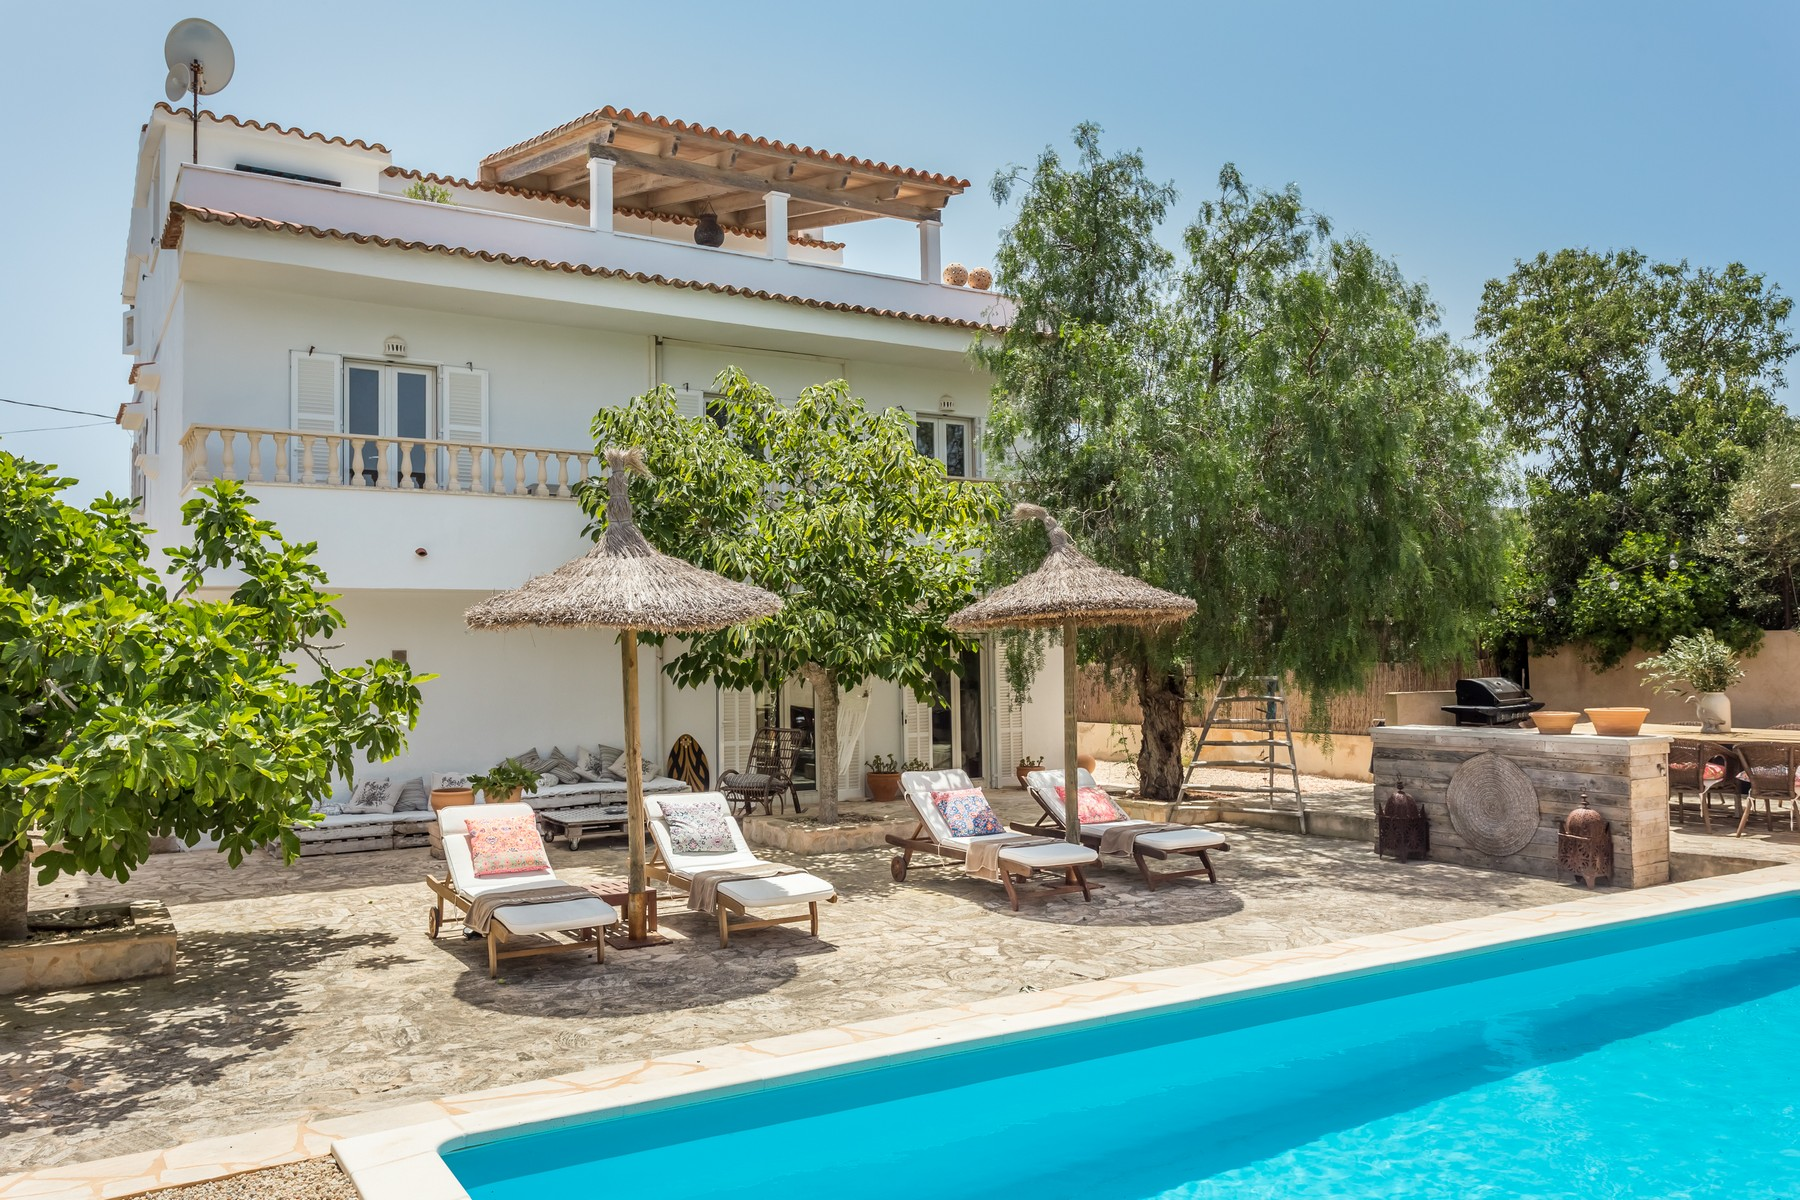 Single Family Home for Sale at Charming villa in Cala Llombards Cala Llombards, Mallorca, 07690 Spain